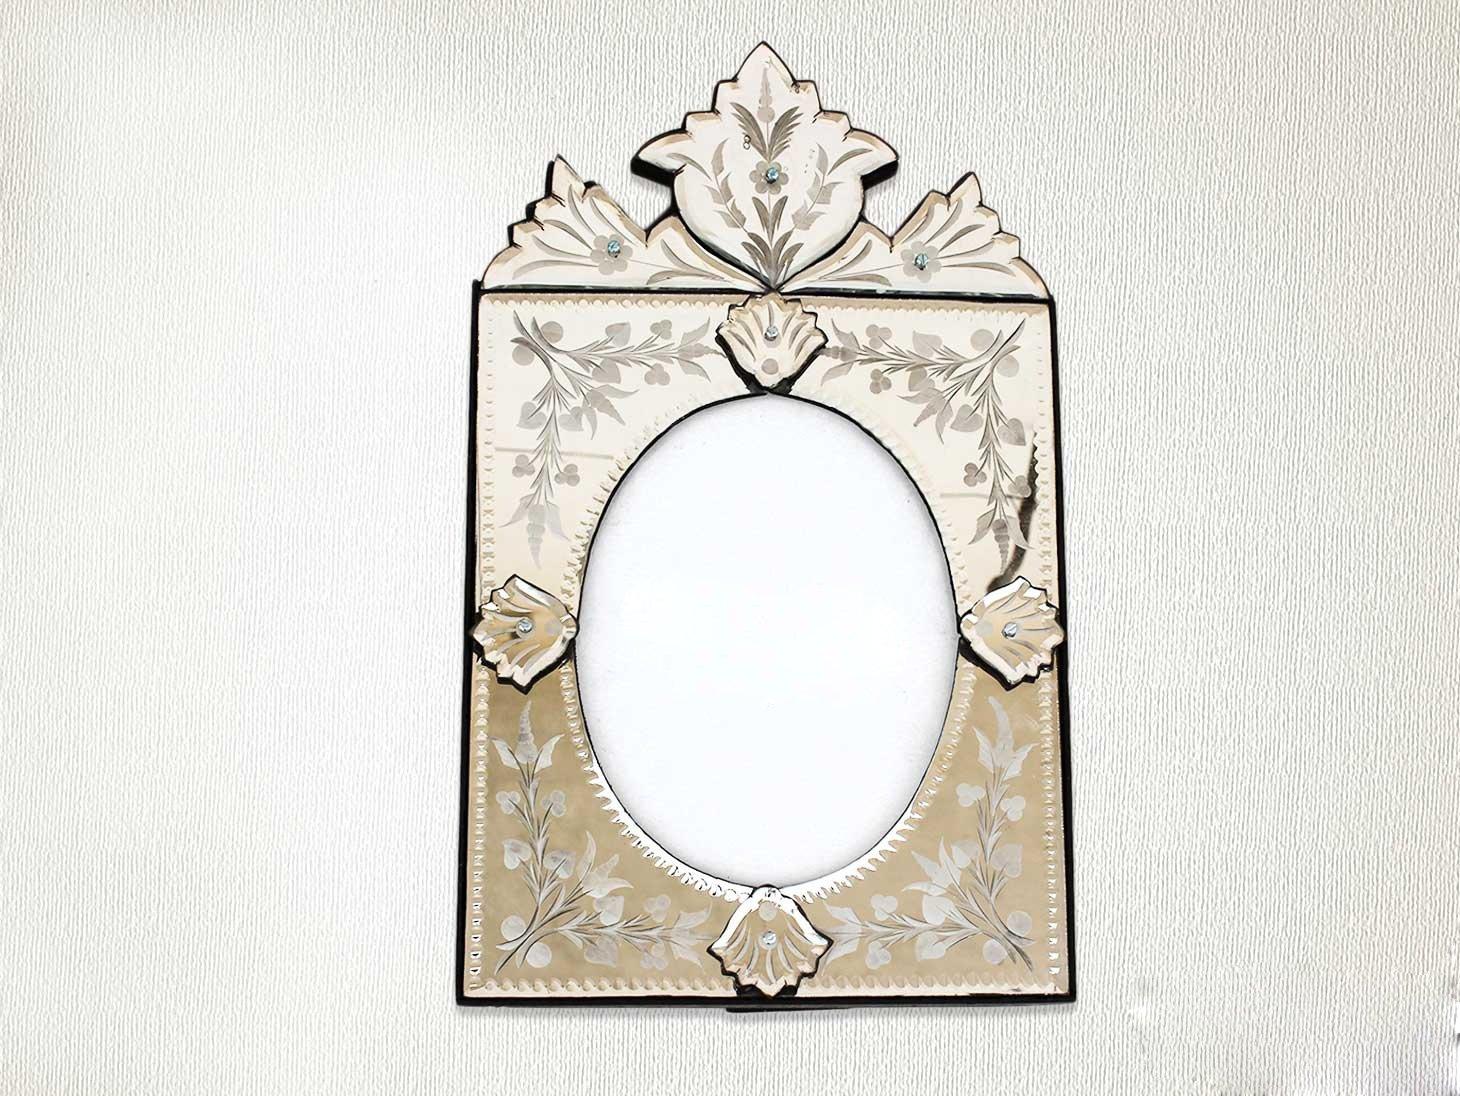 Indianshelf Handmade Decorative Clear Wood Glass and Iron Vintage Venetian Photo Frame Home Decor Gift Item